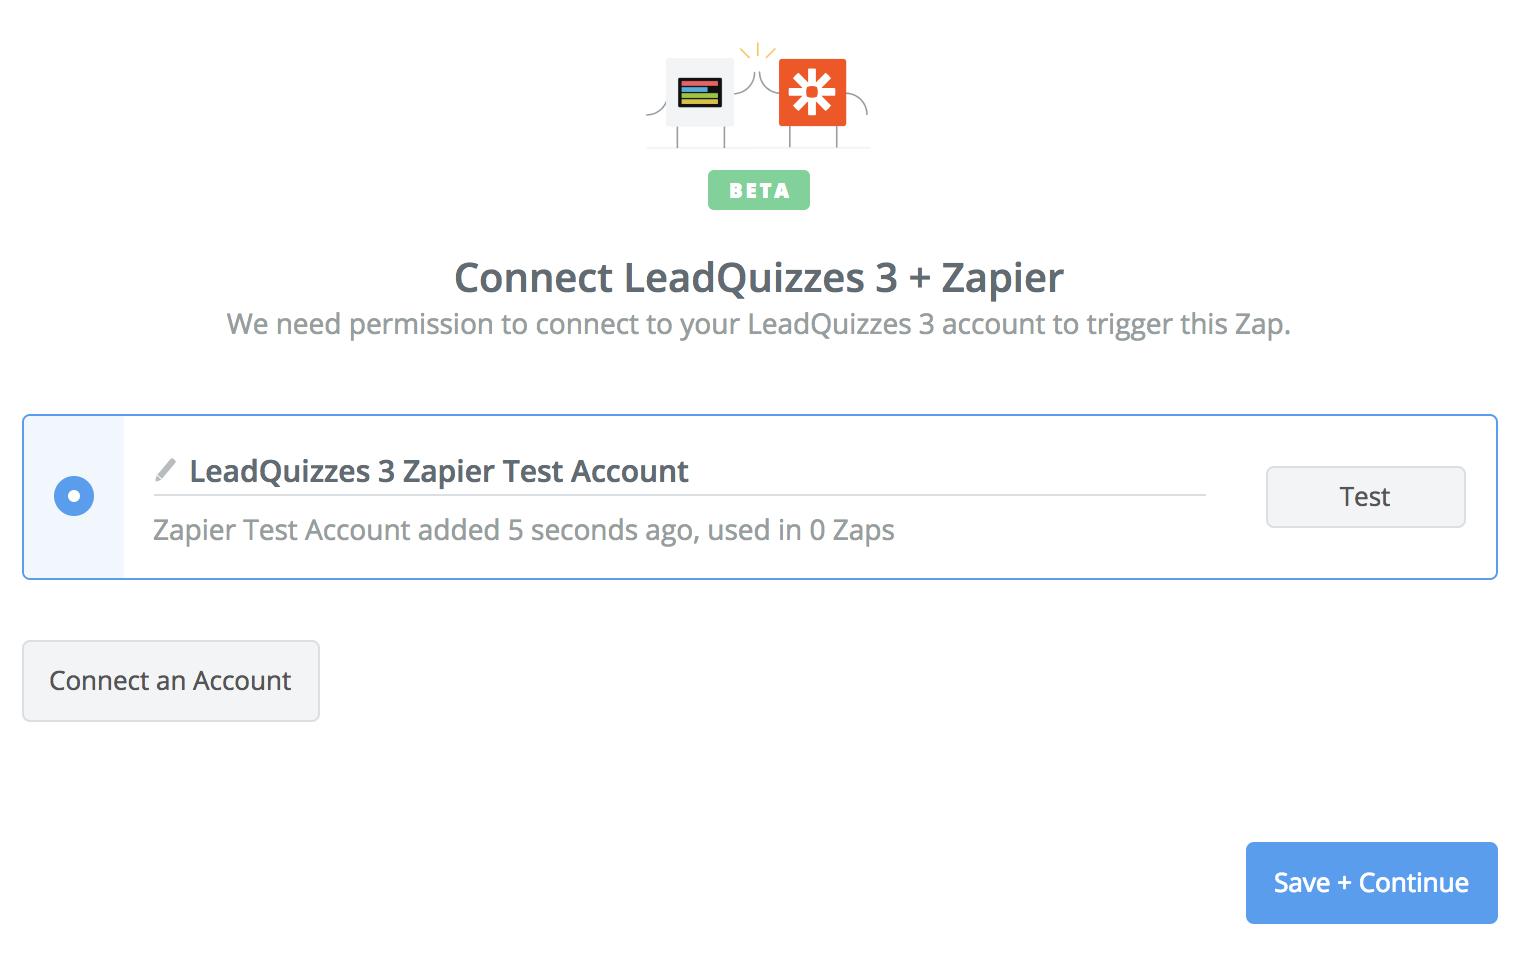 LeadQuizzes 3 connection successful